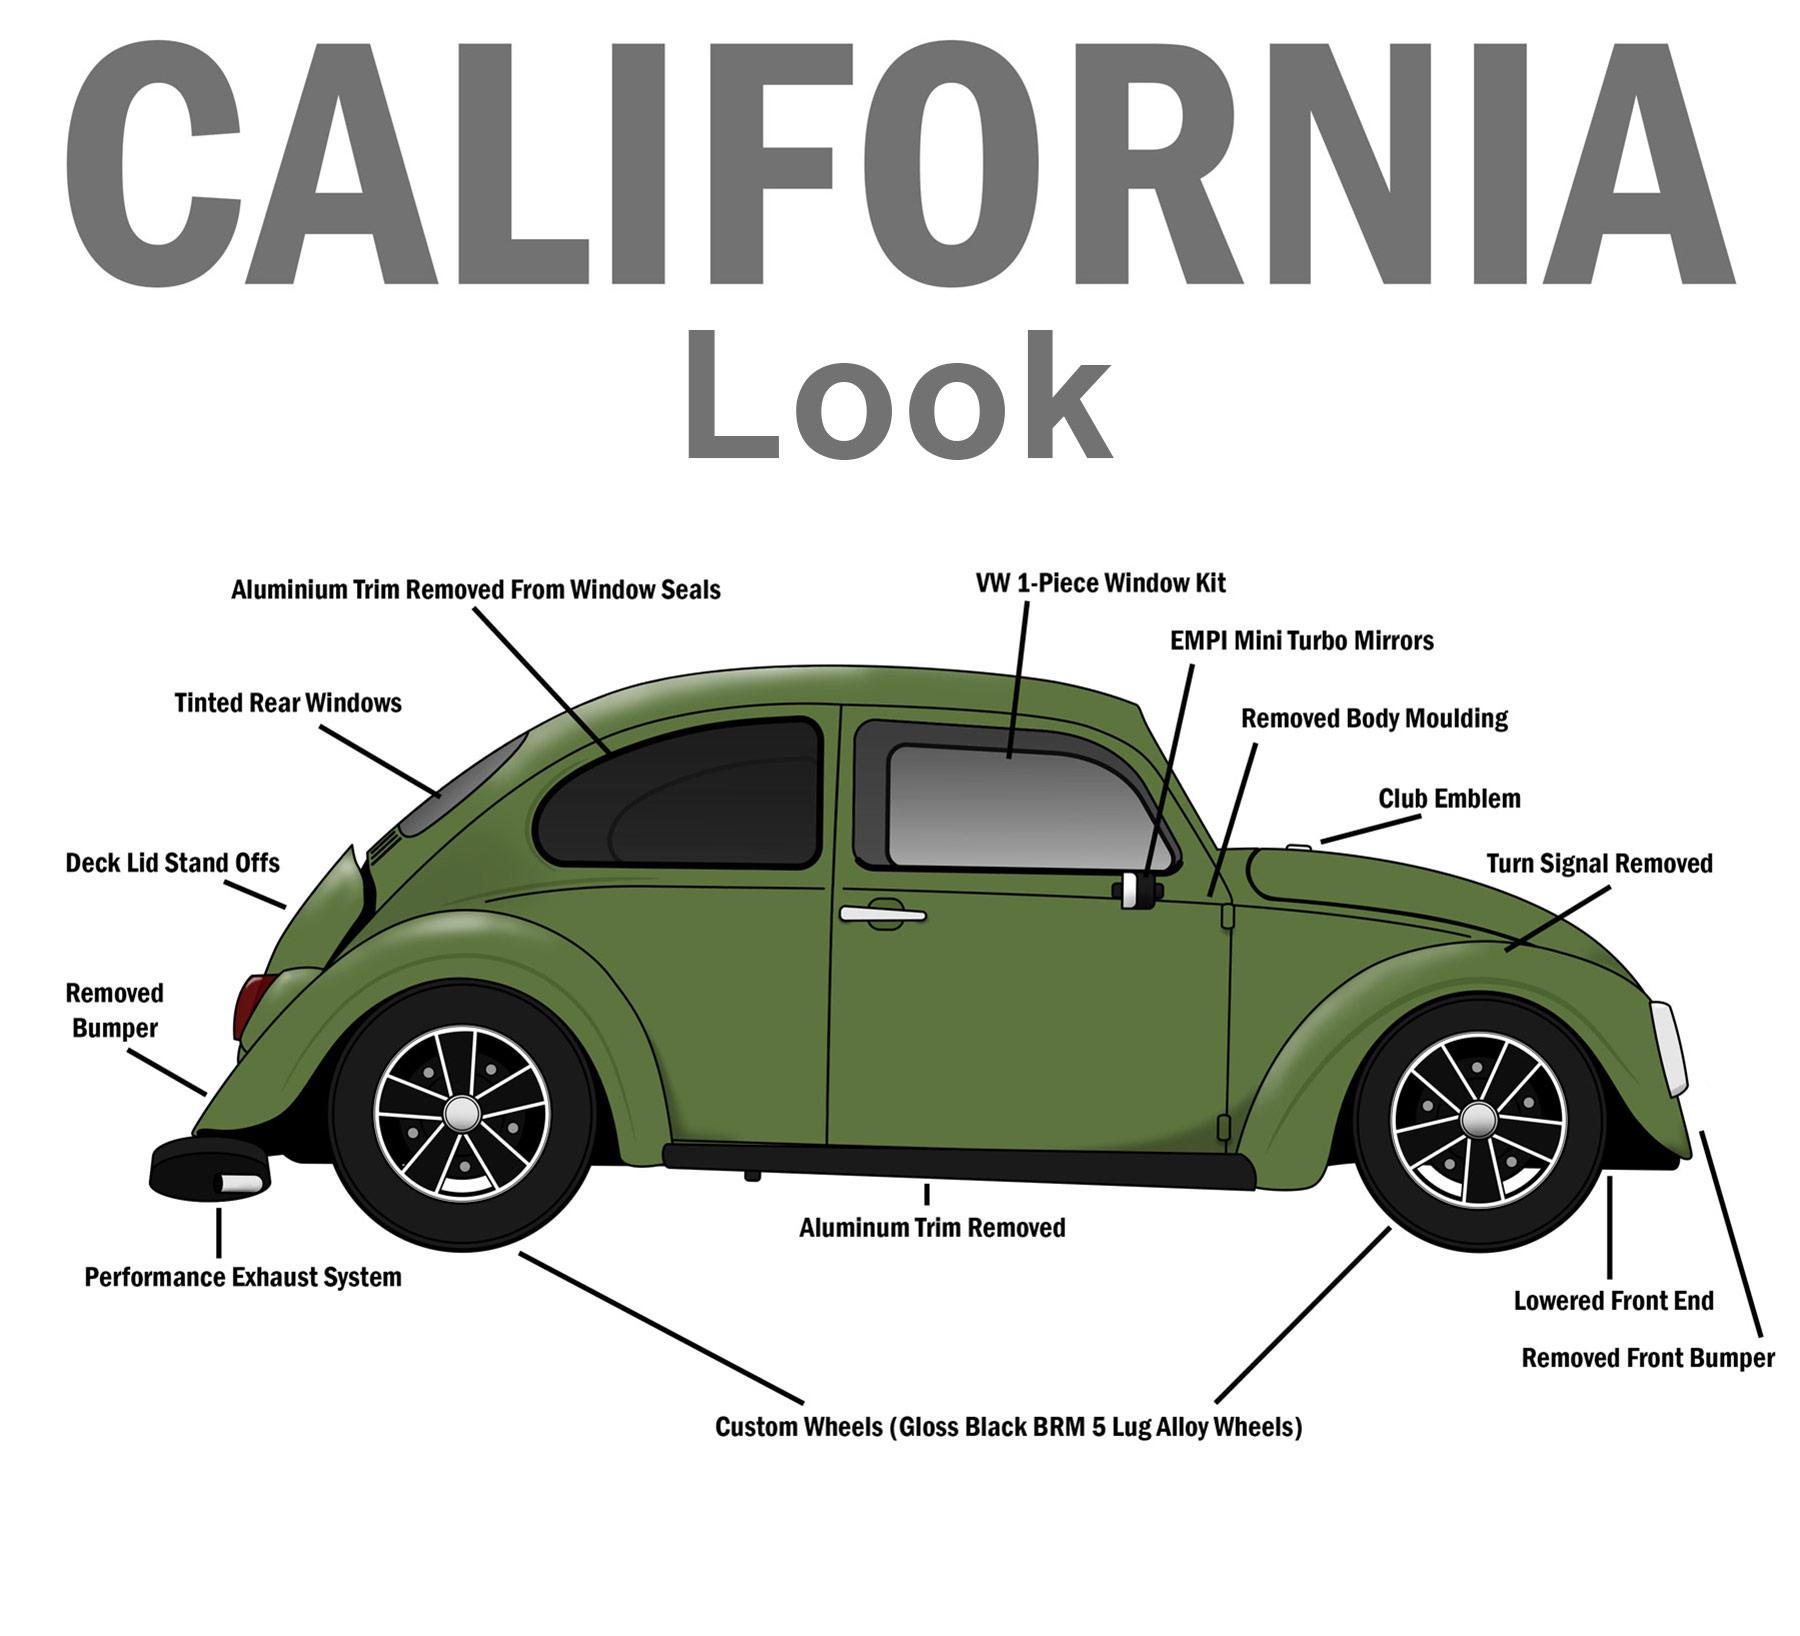 https://cdn.discordapp.com/attachments/742292124908781569/742292194056077362/California-Style-Beetle-1800px.jpg